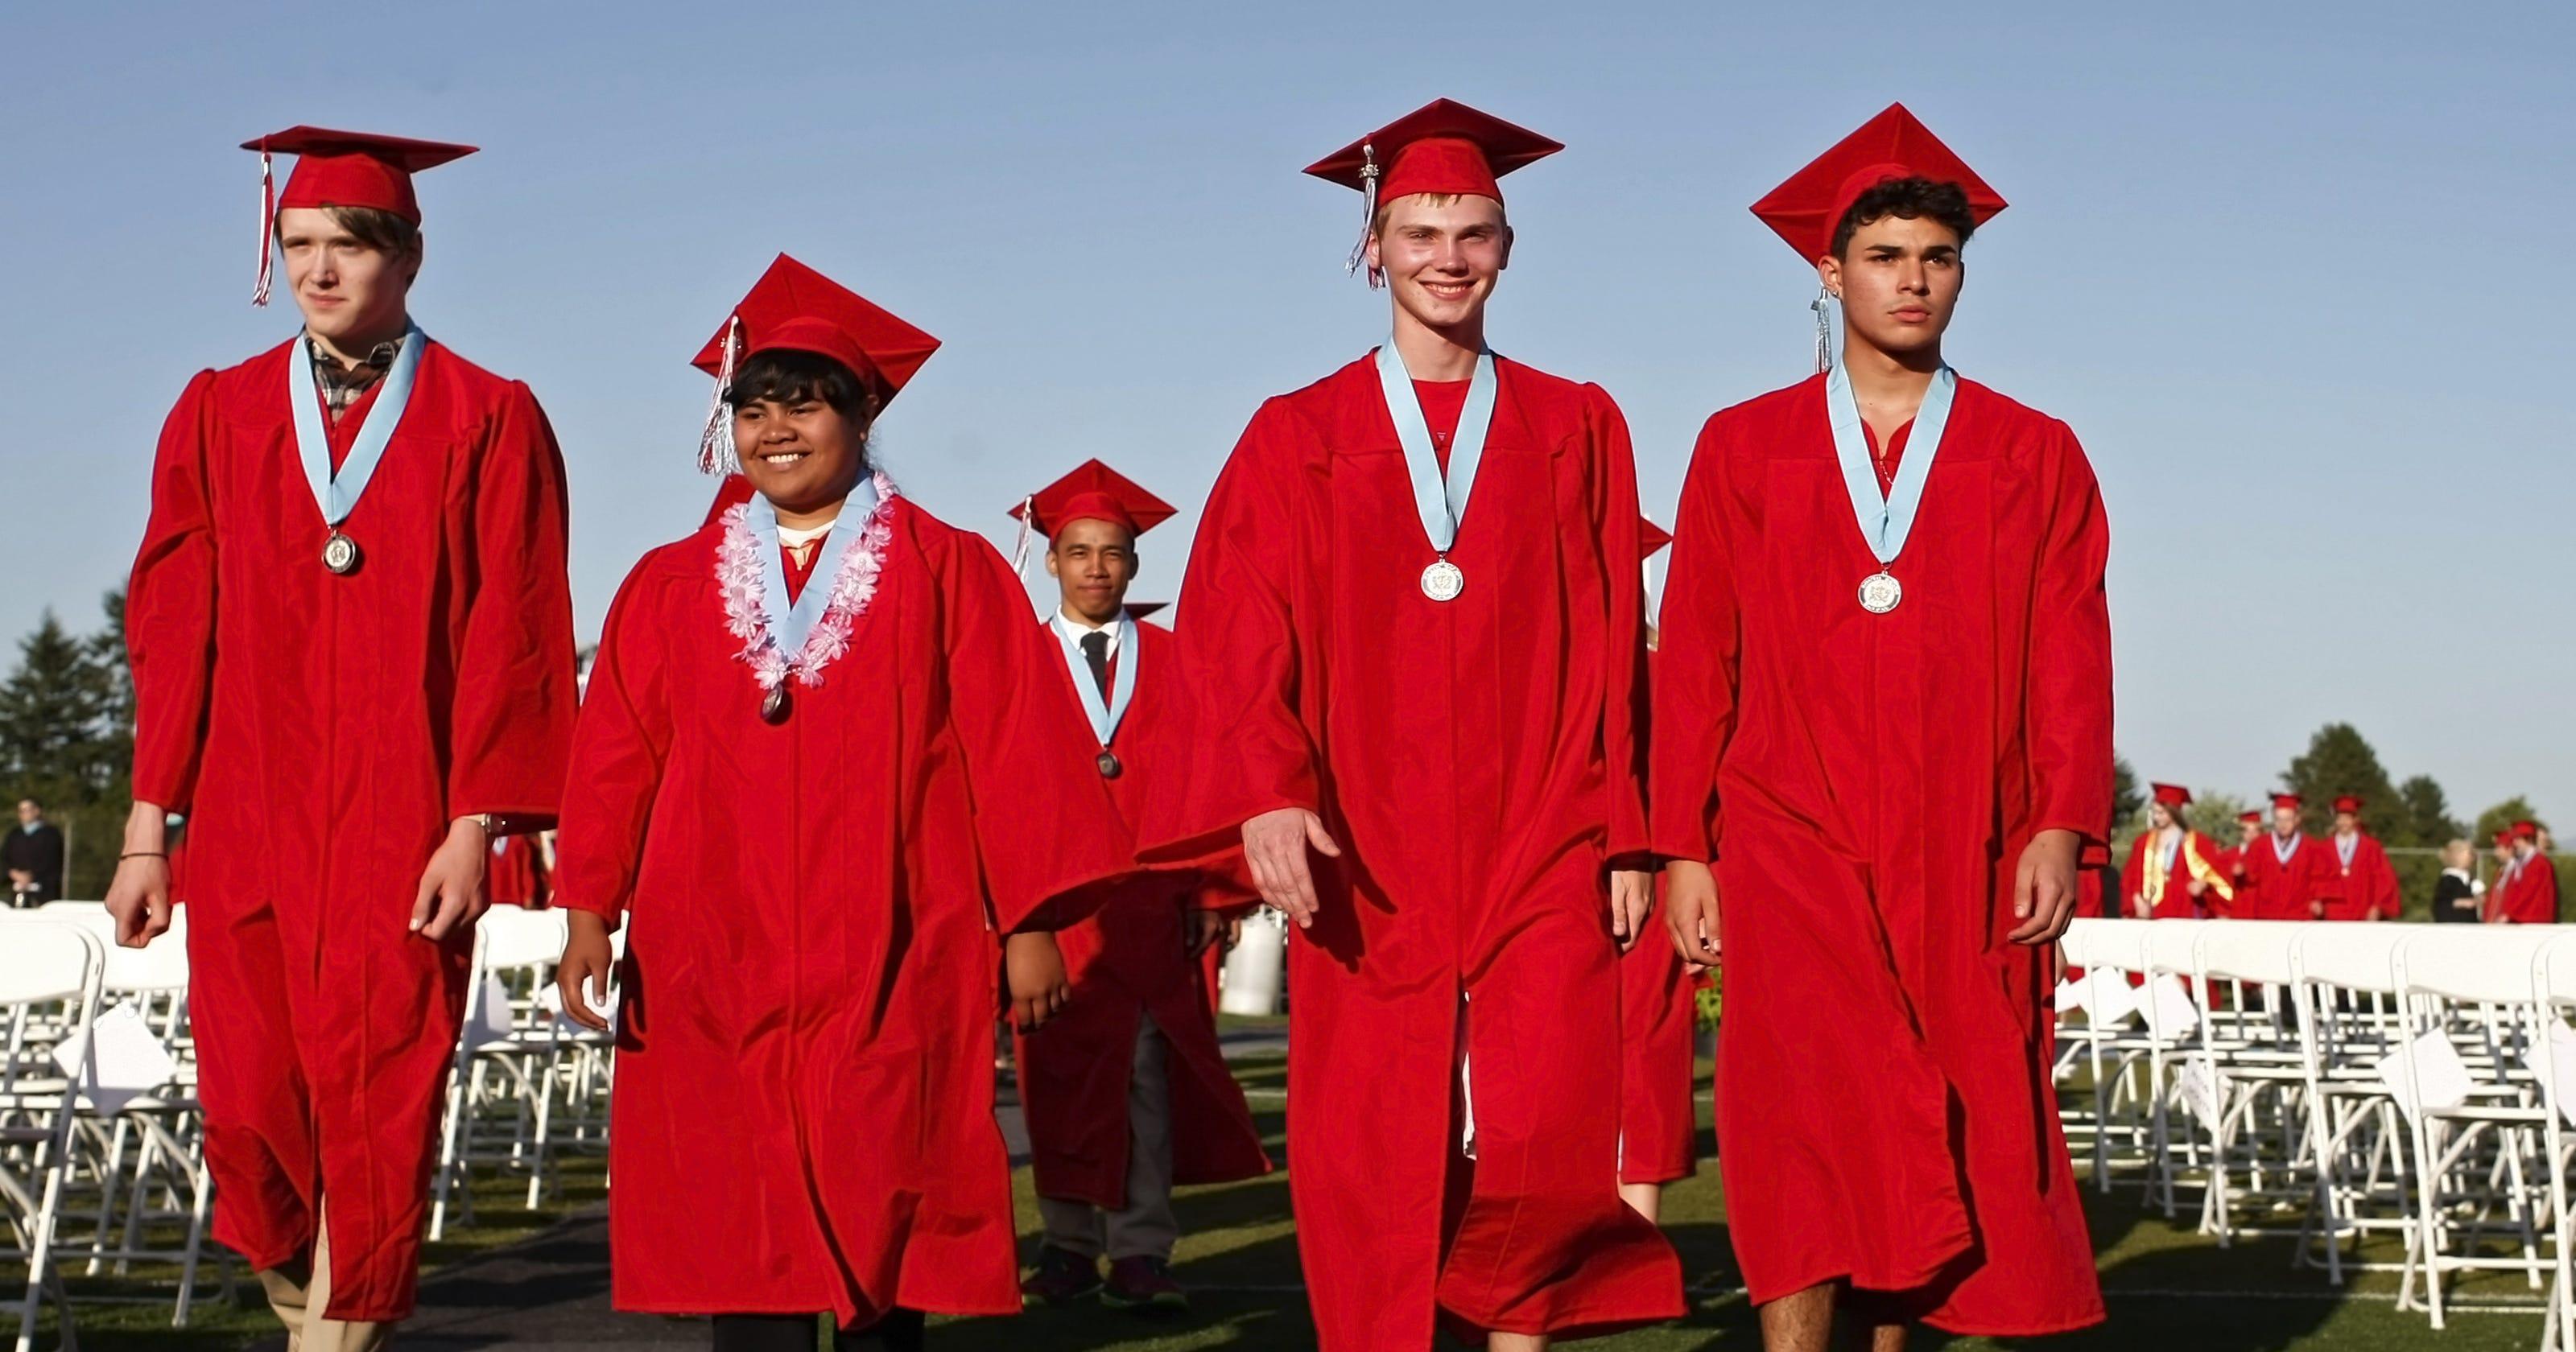 Do graduation ceremonies harm the environment?